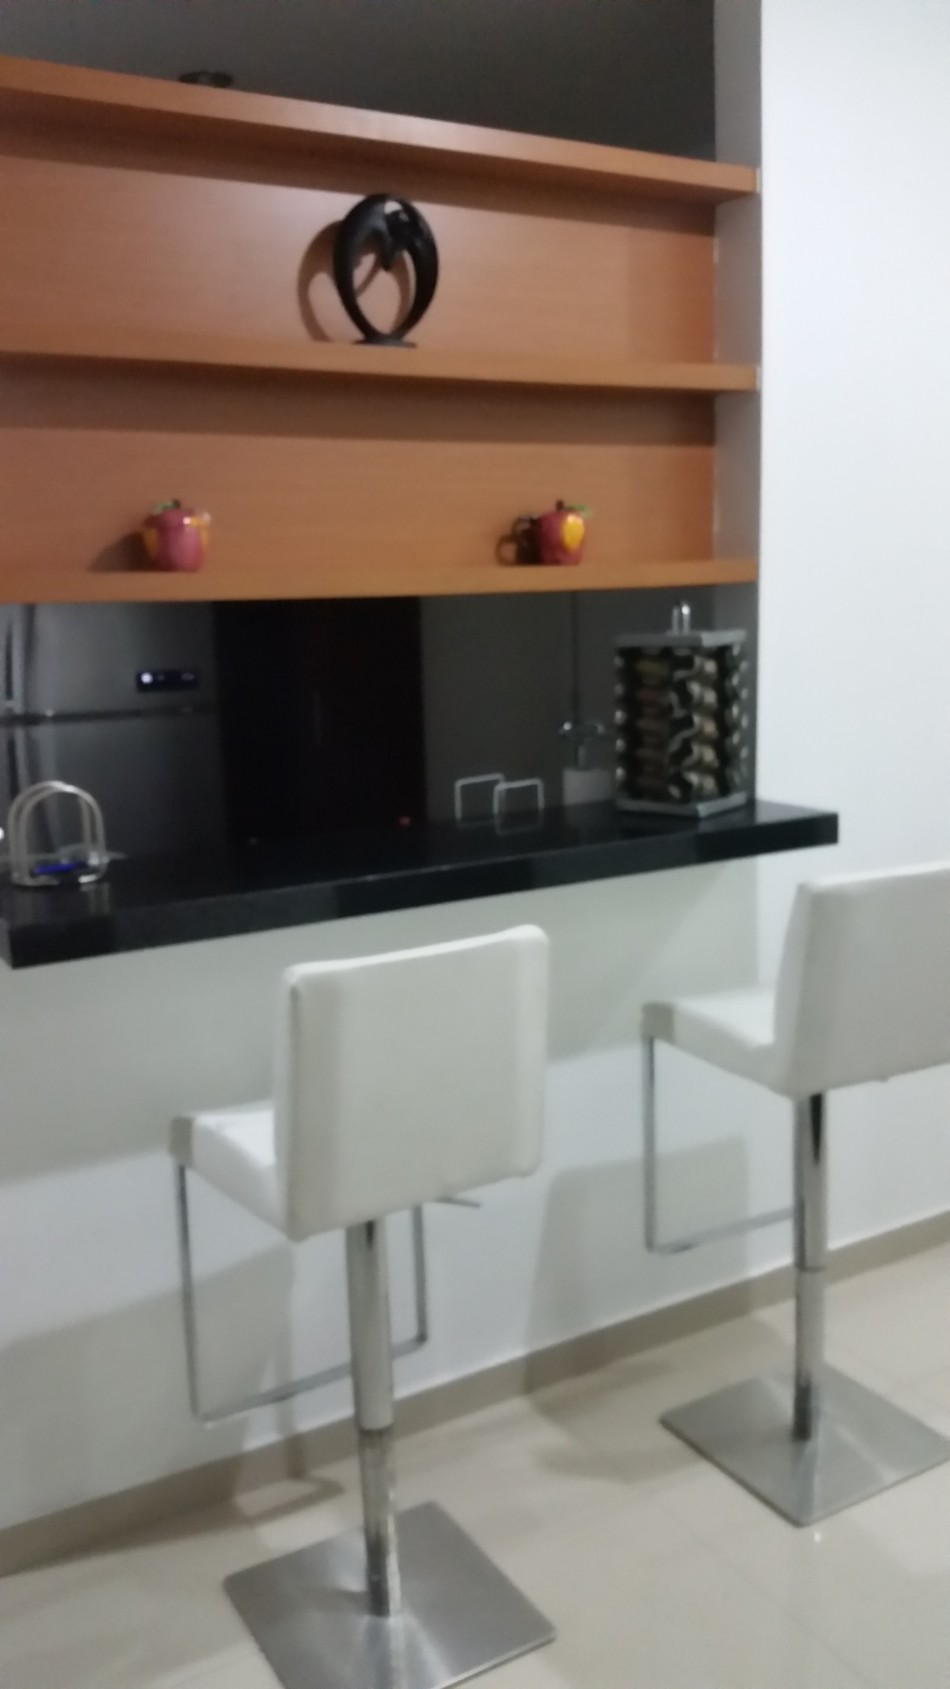 Apartamento en nuevo sotomayor bucaramanga mimansion for Bateria de cocina alemana